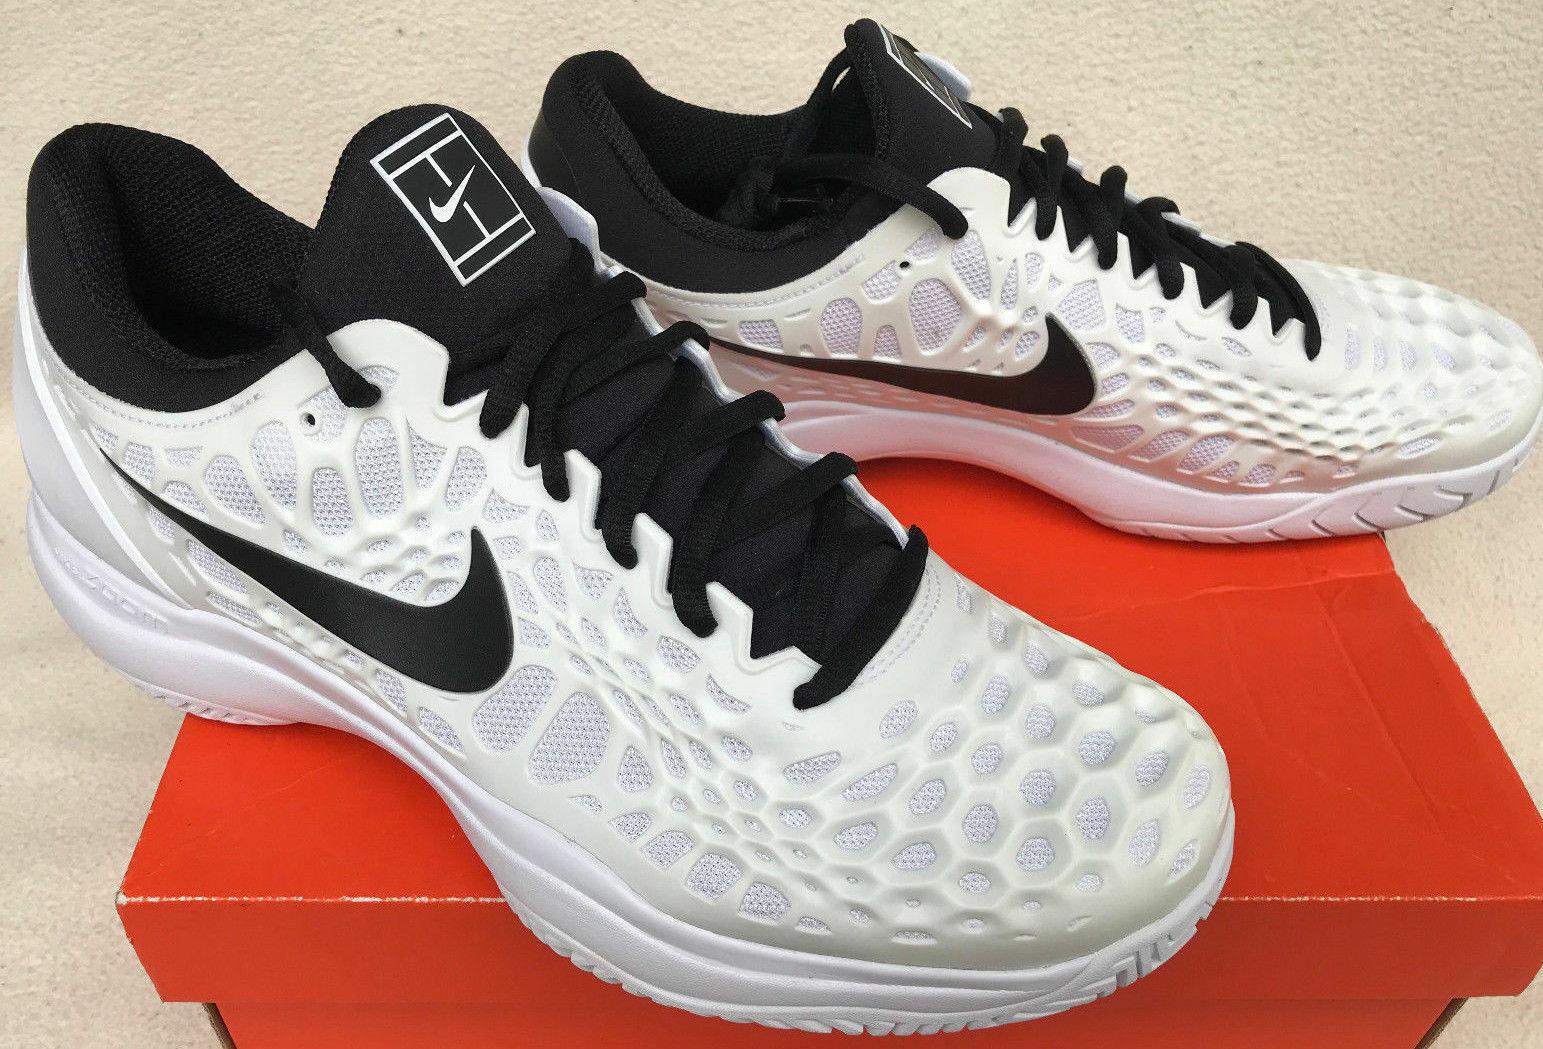 Nike Air Zoom Cage 3 HC Hard Court Tennis shoes White Black ( AJ3355-101 ) SZ 13